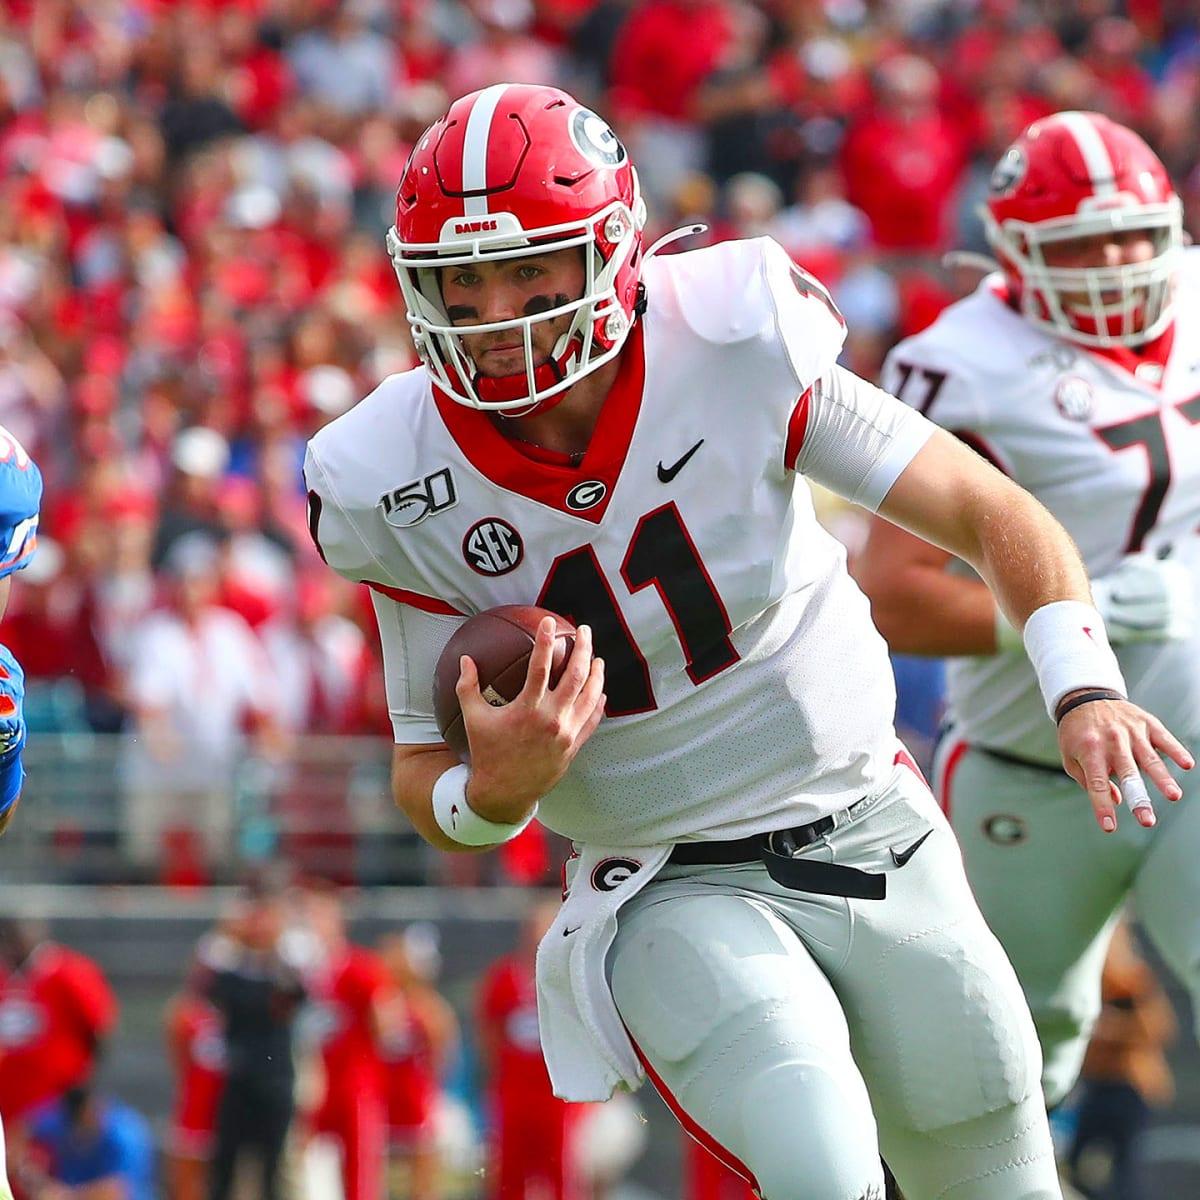 Jake Fromm Georgia Bulldogs Football Jersey - Red